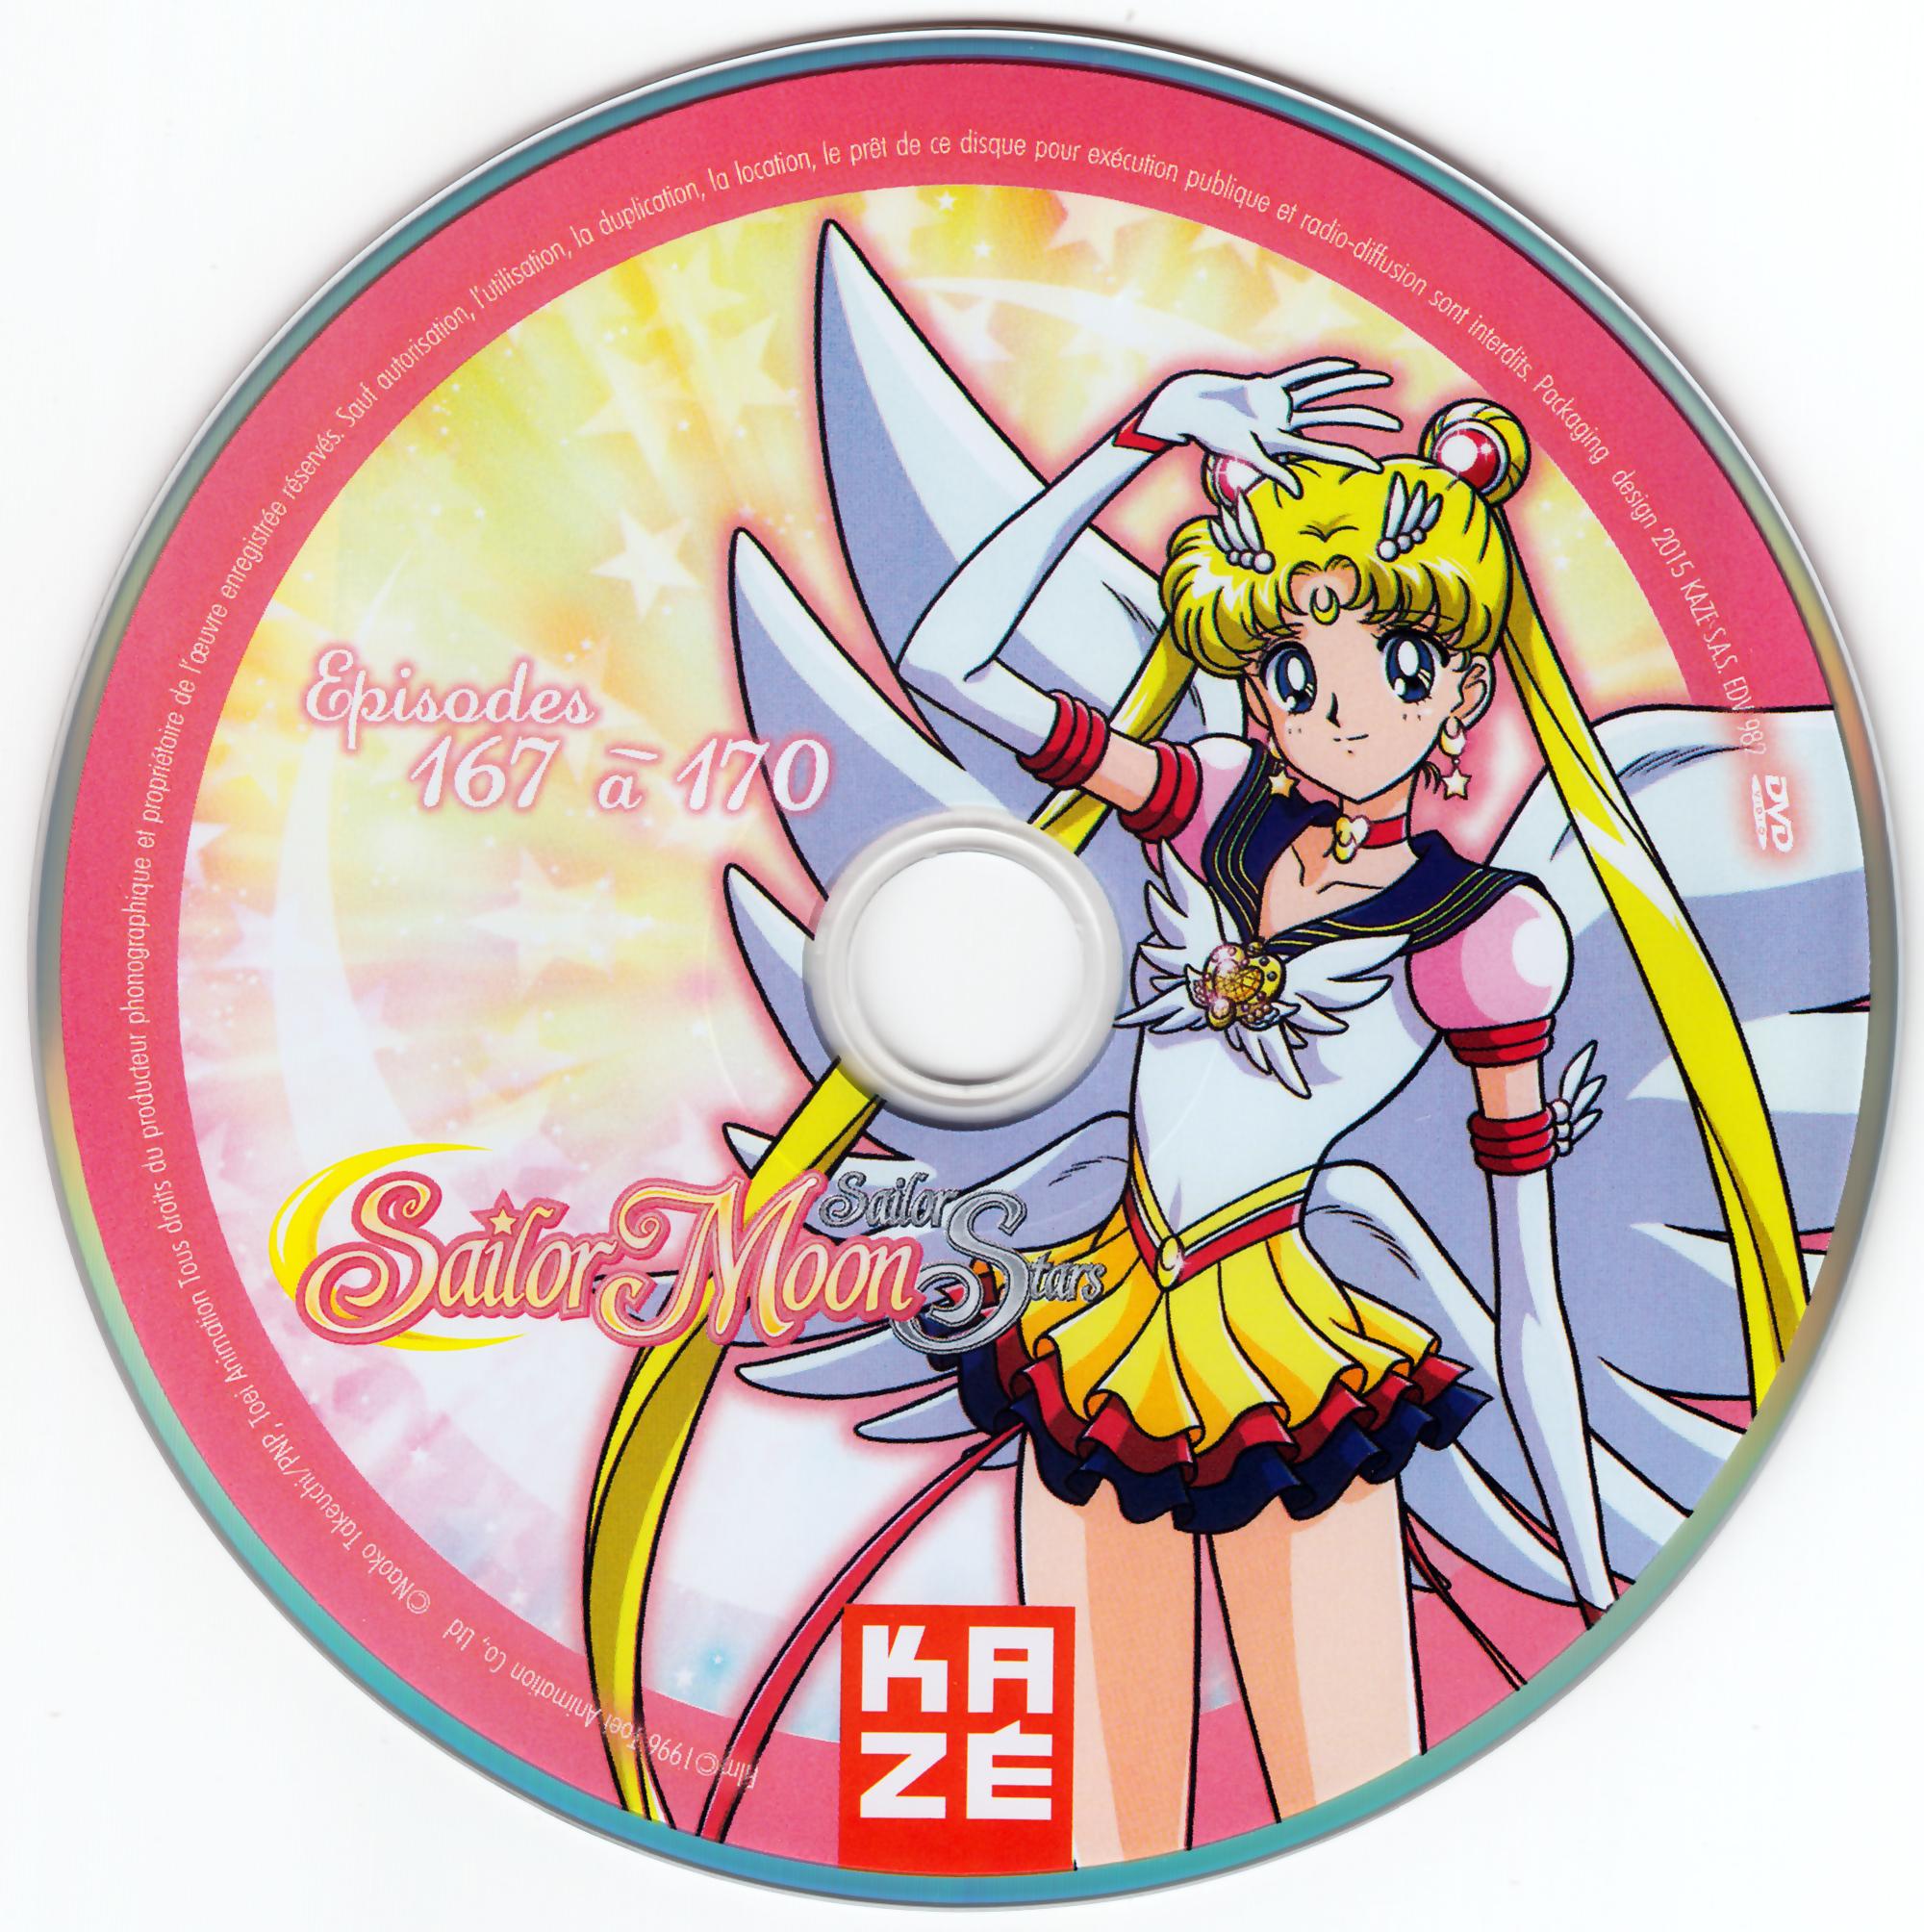 Sailor-moon-sailor-stars-dvd-boxset-15